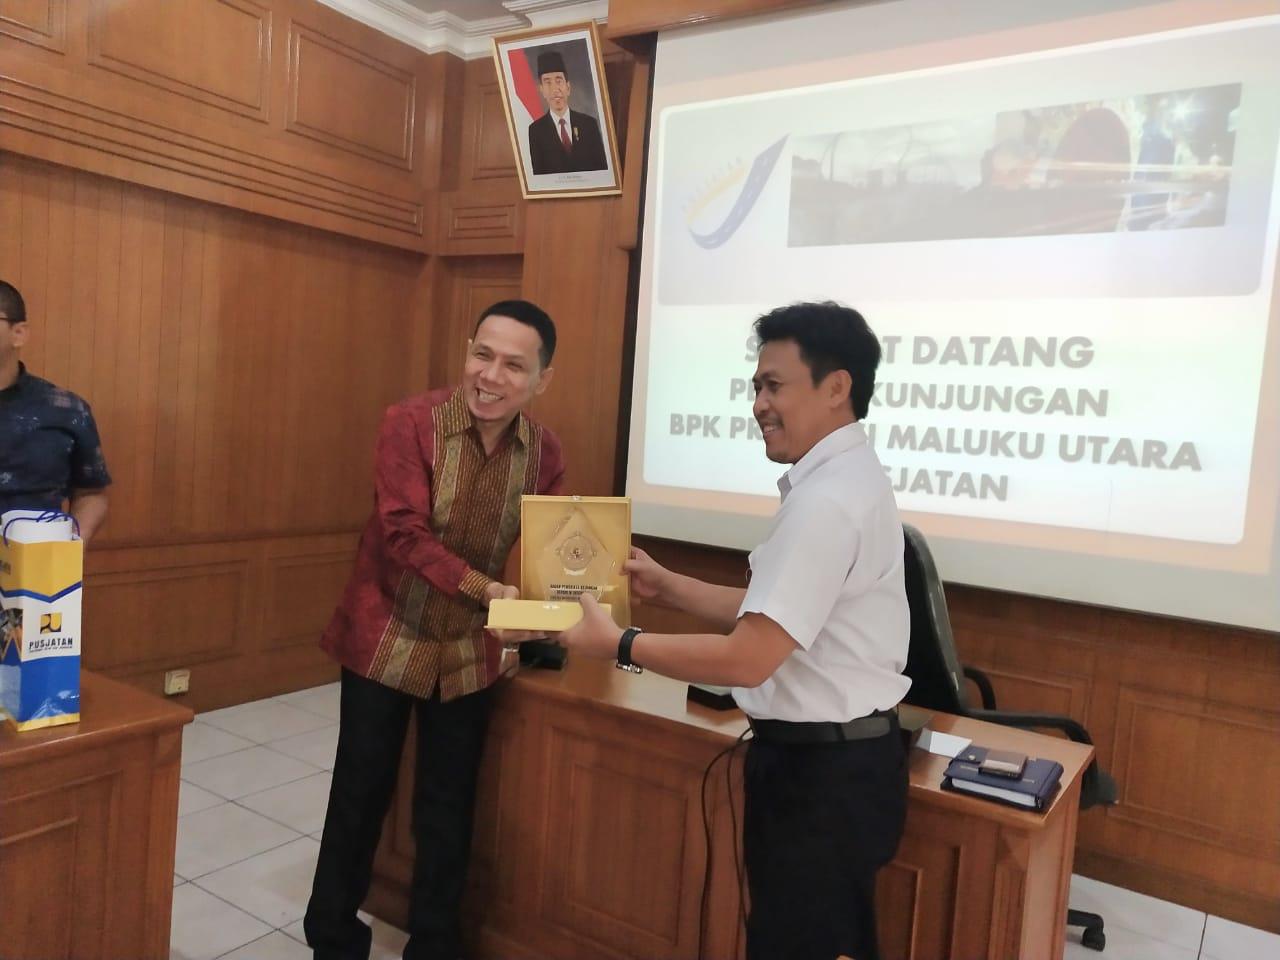 BPK Perwakilan Provinsi Maluku Utara Kunjungi Pusjatan